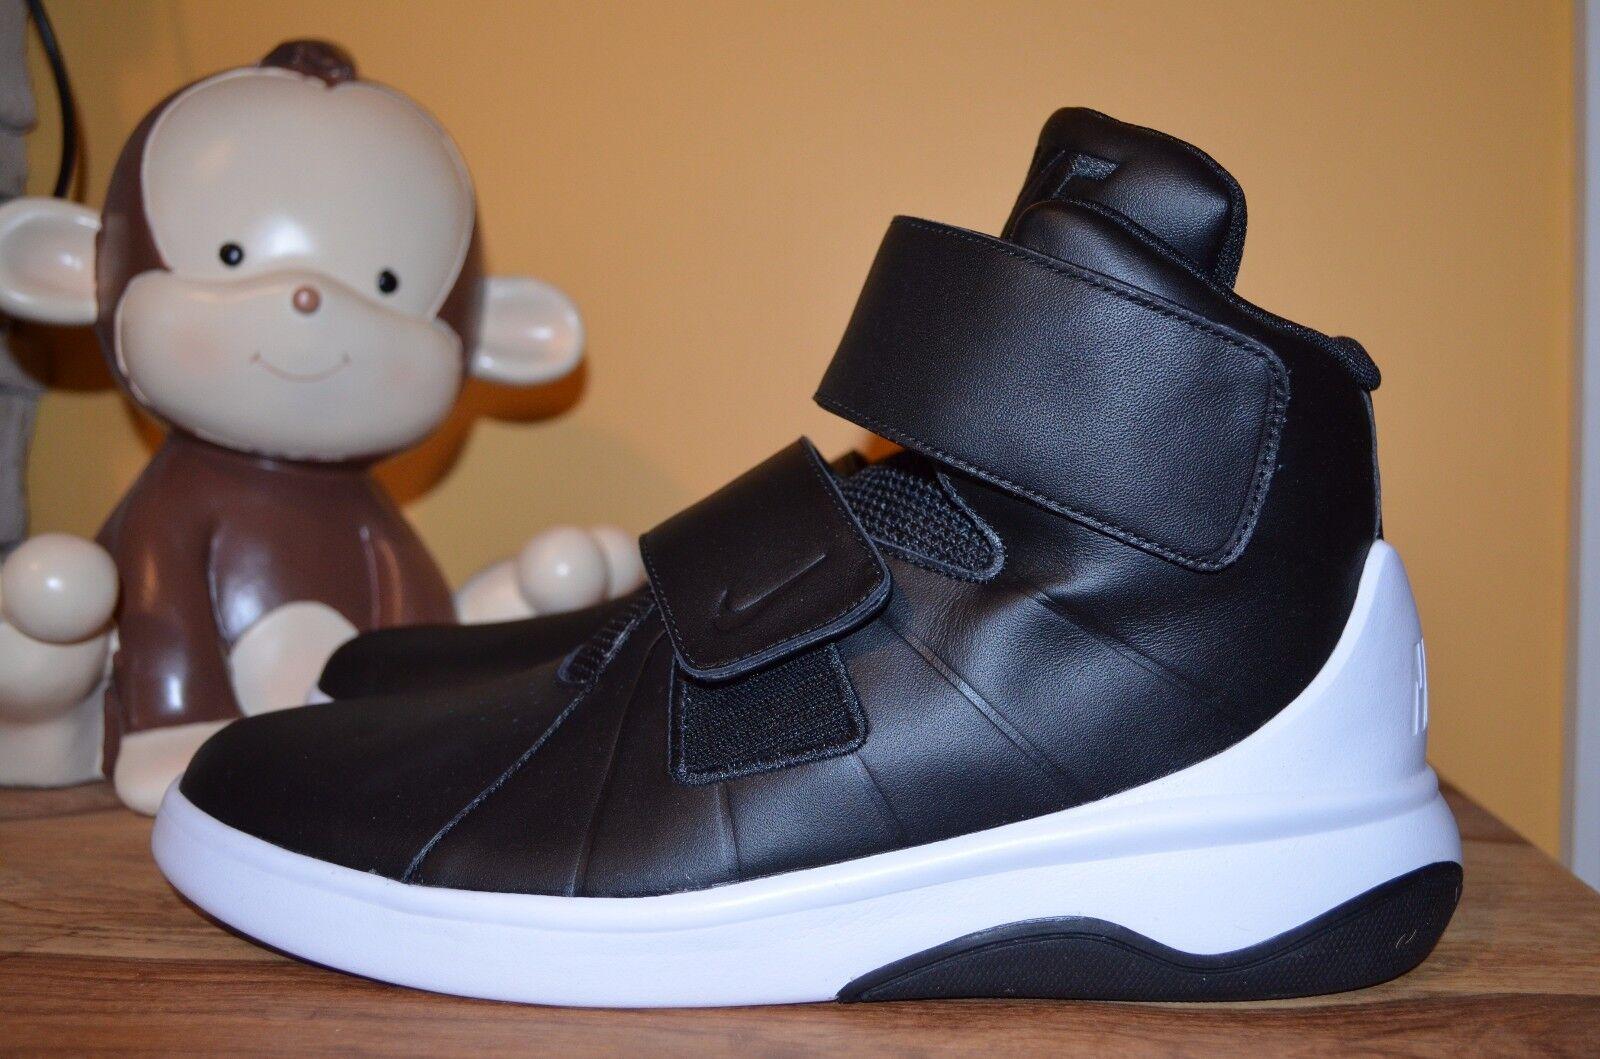 ccbad1ec5bf94 NEW NIKE MARXMAN Casual Hi Top Top Top shoes SZ 10.5 11 Black White 832764-